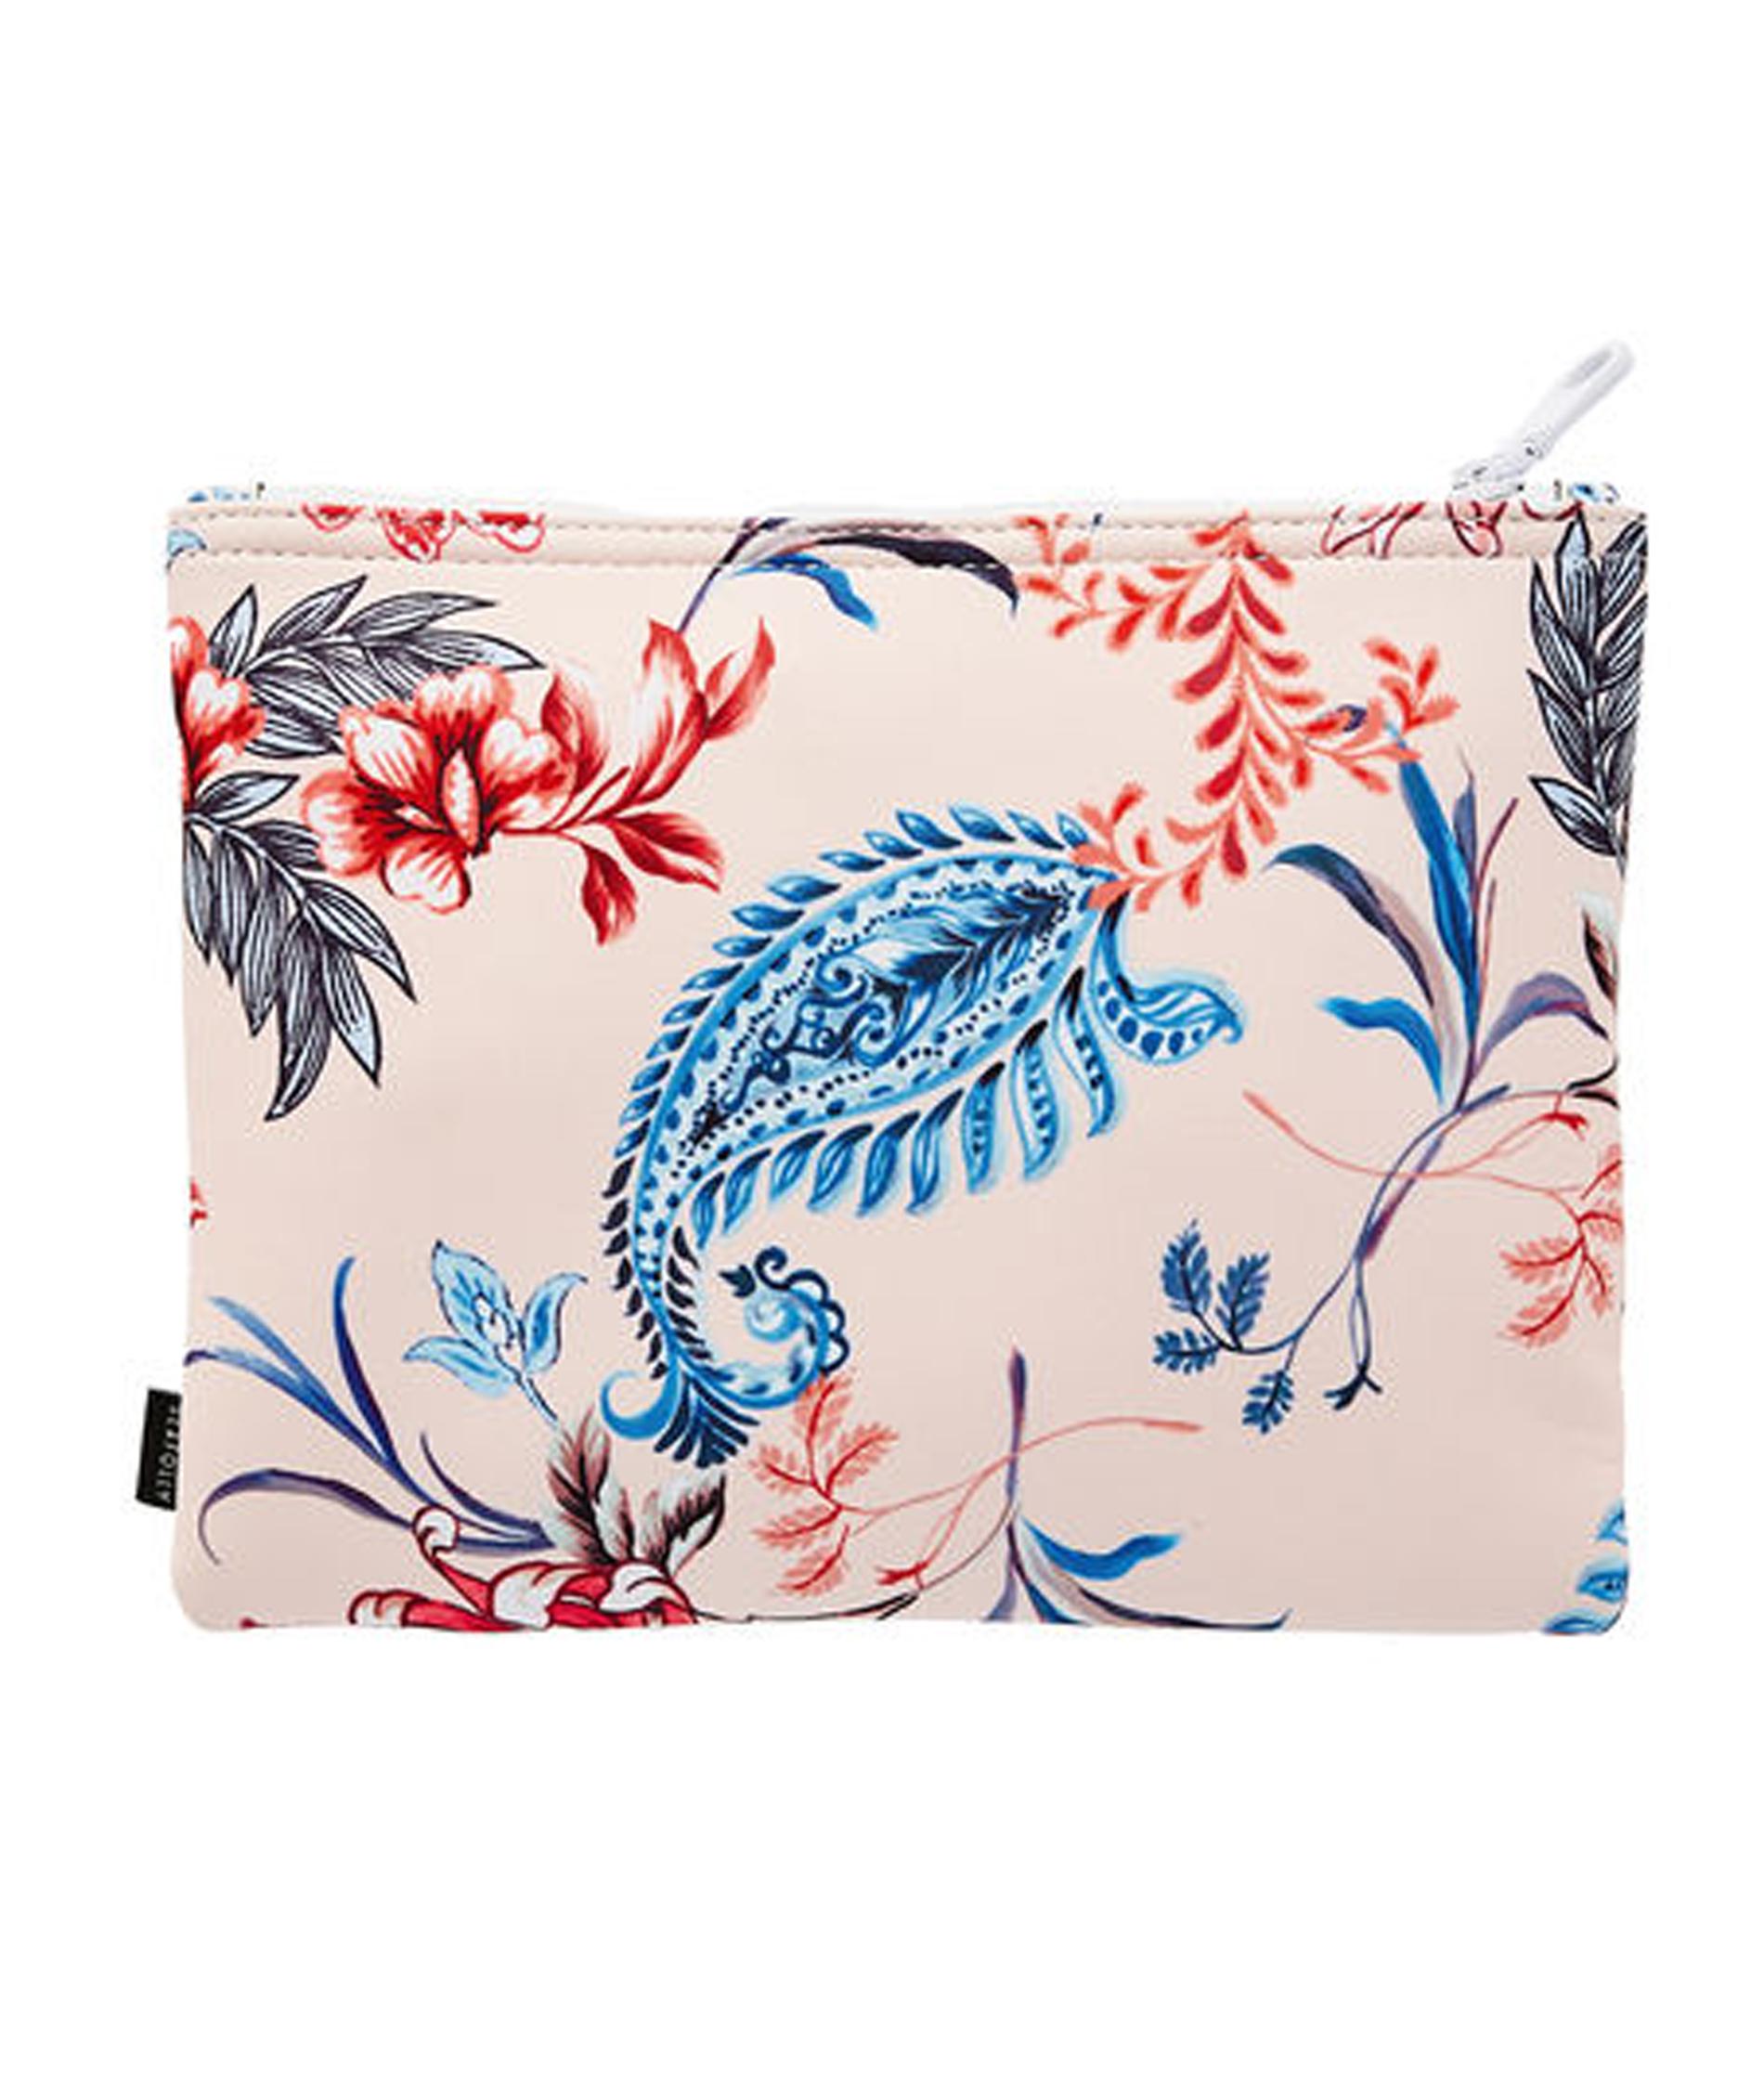 Seafolly Water Garden Bikini Bag - Petal